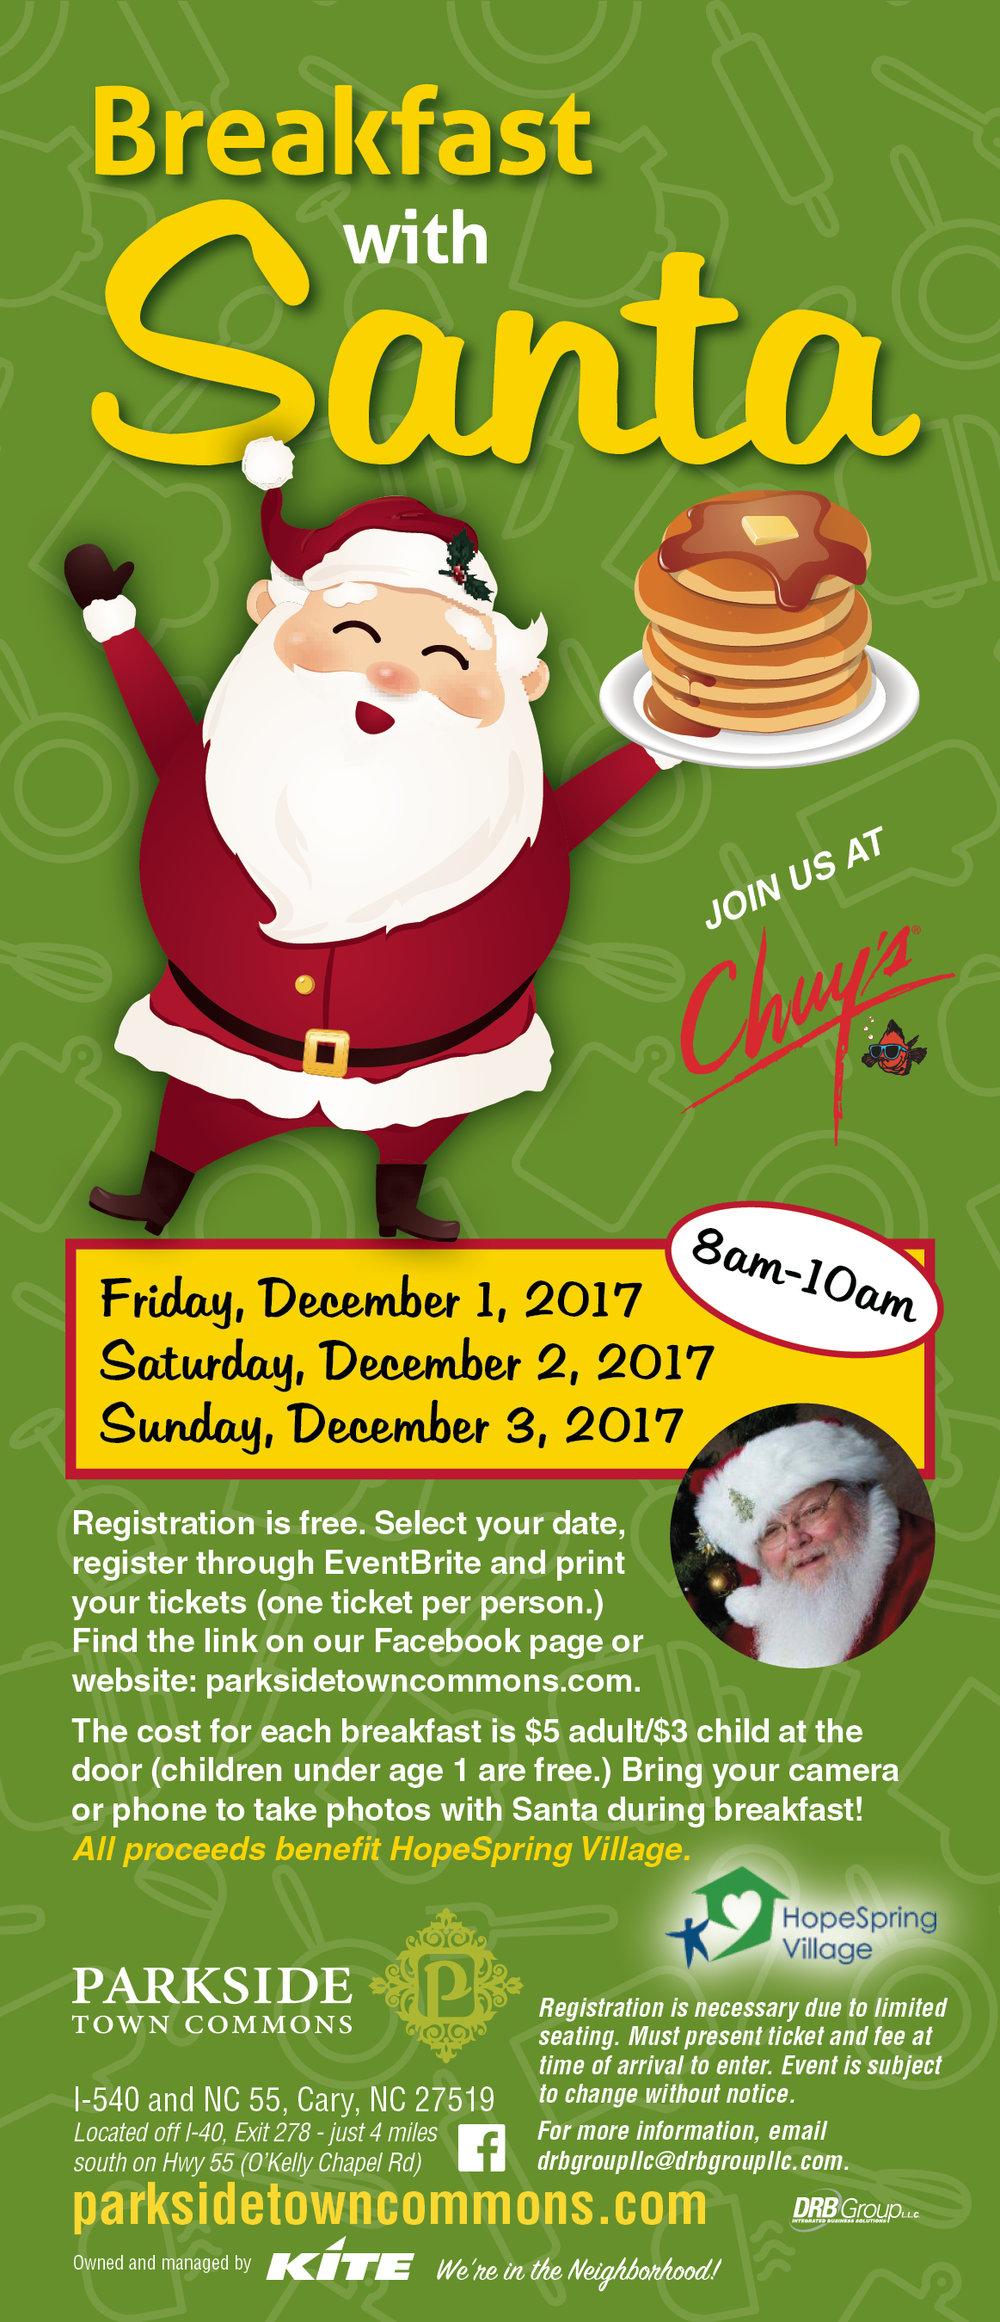 parkside_santabreakfast2017_buckslip_PRINT.jpg